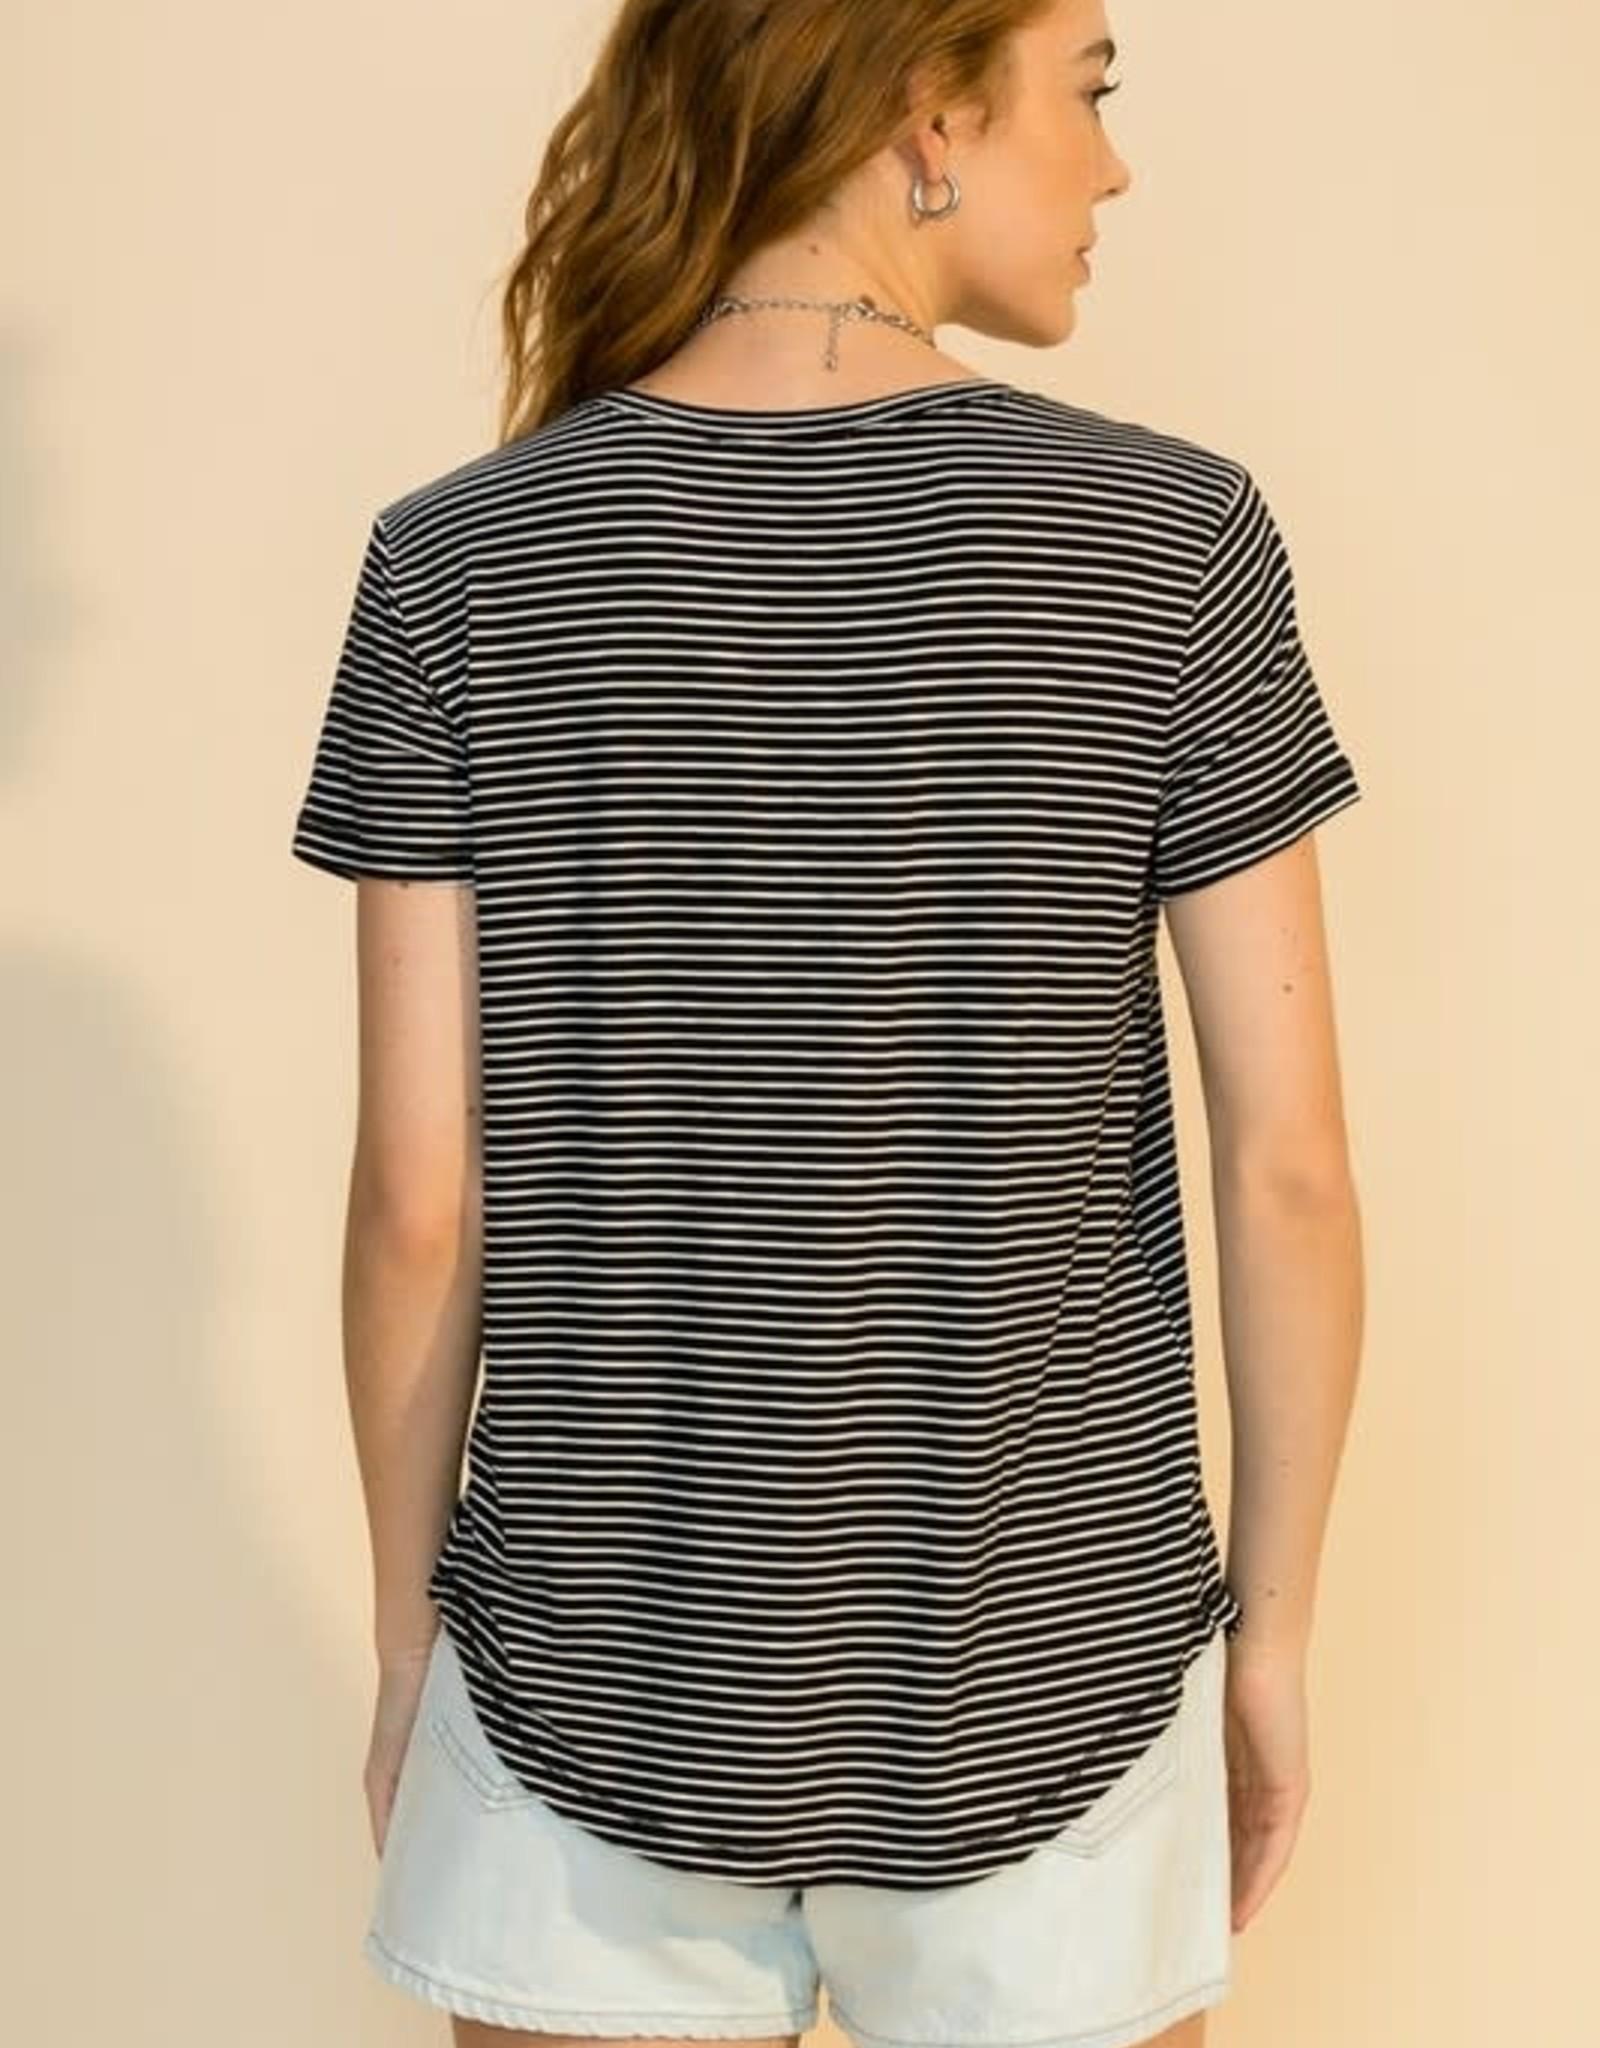 - Black/White Stripe Heathered Texture V-Neck Top